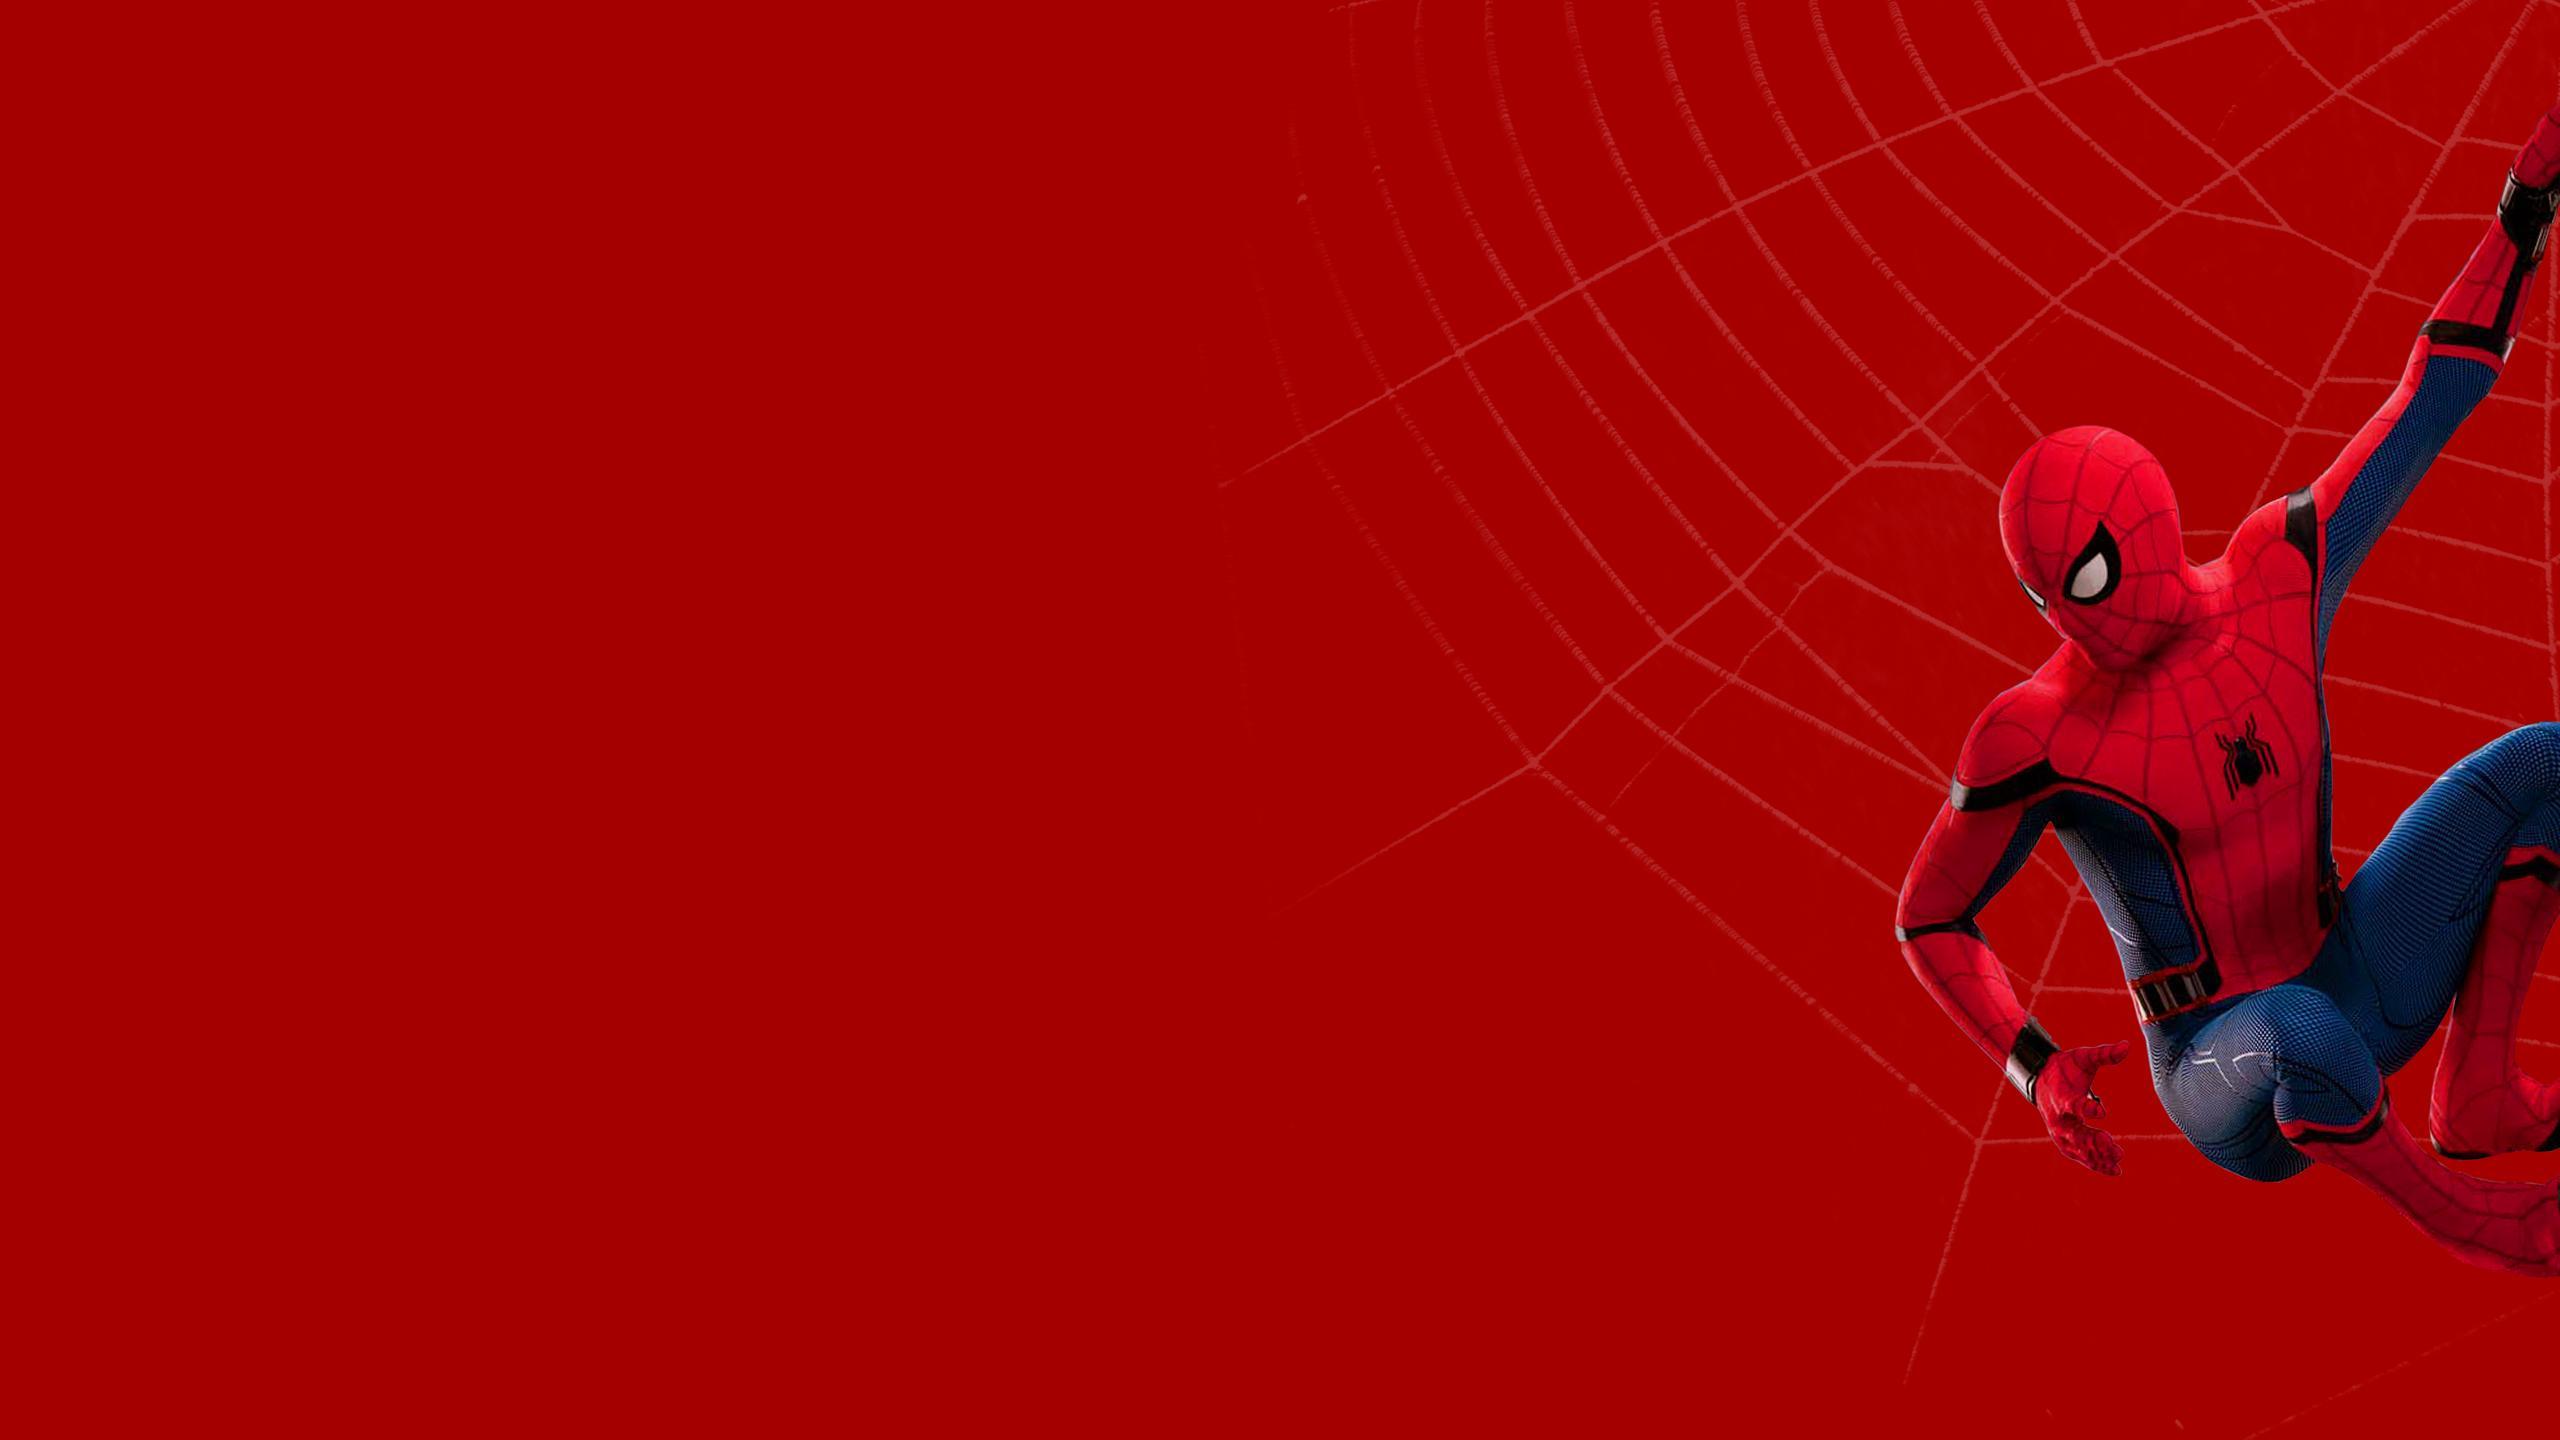 spiderman homecoming wallpaper,red,spider man,fictional character,superhero,deadpool